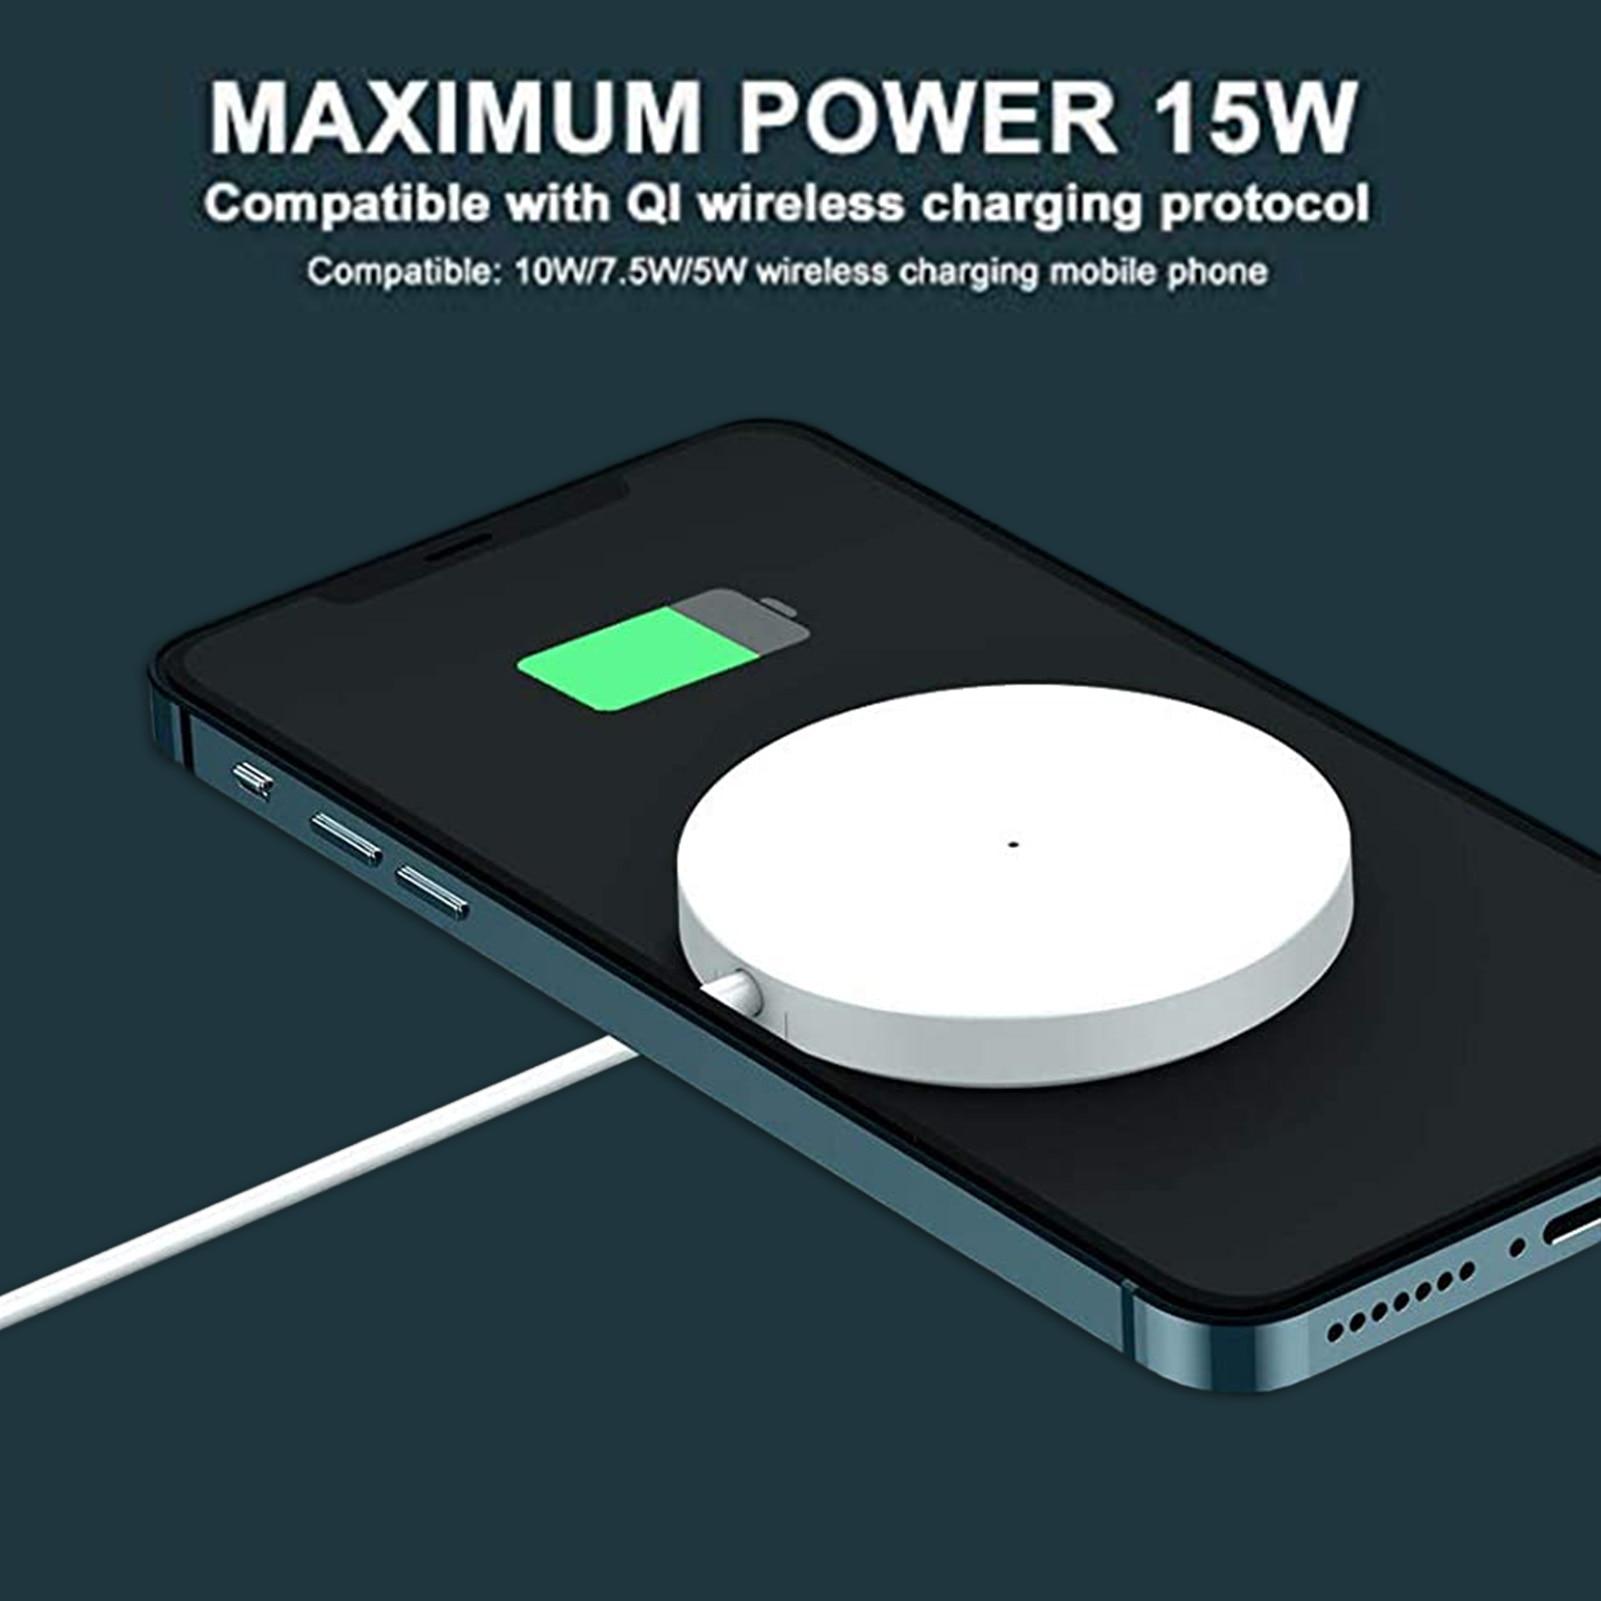 15w magnético branco carregador sem fio 15w para iphone 12 pro max mini carregamento rápido para magsafe carregador sem fio rápido para xiaomi